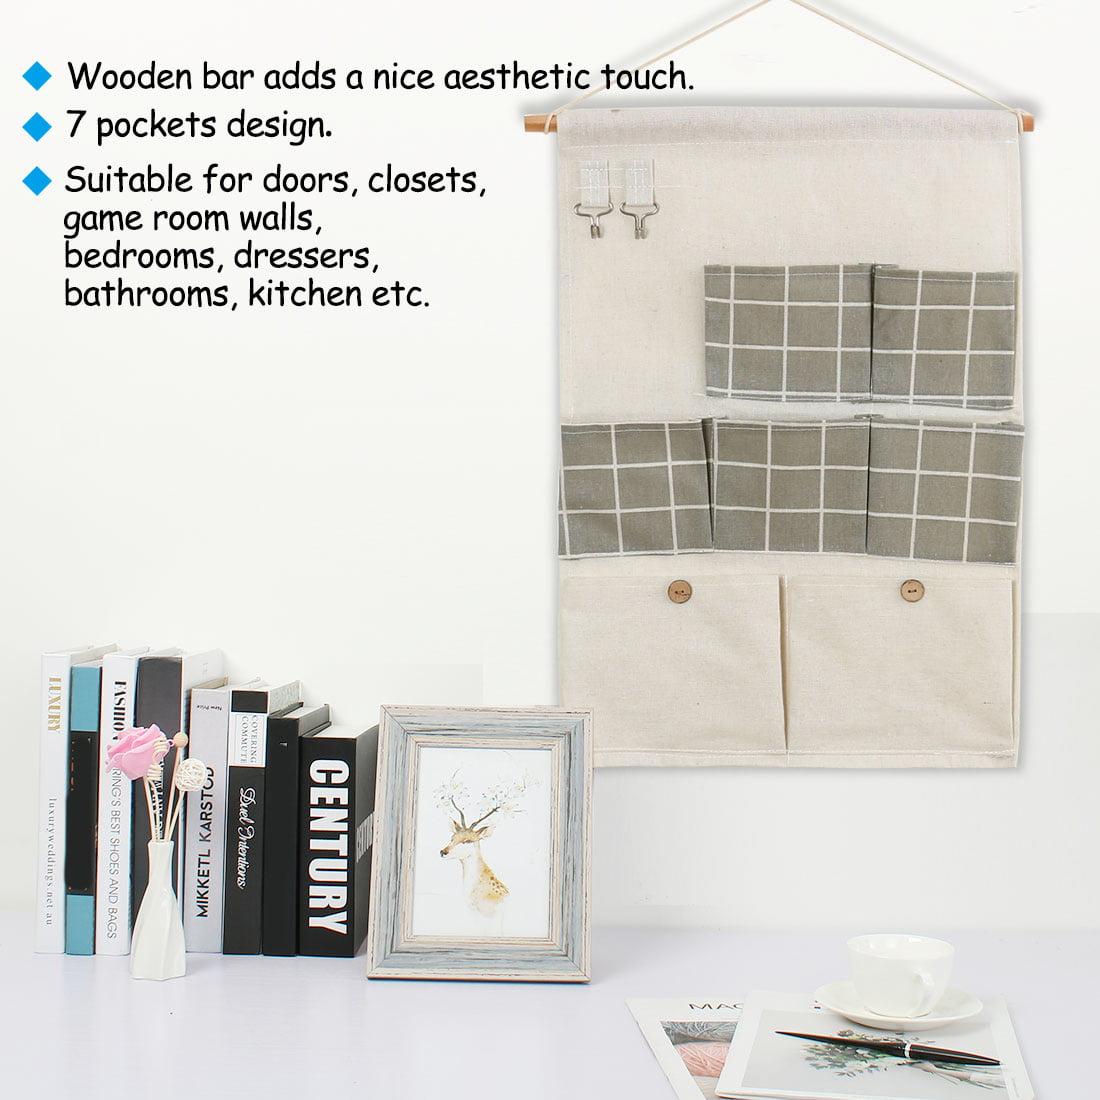 "Closet Foldable Hanging Storage Bag 19.5"" x 13.6"" Organizer Gray Square Pattern - image 2 de 7"